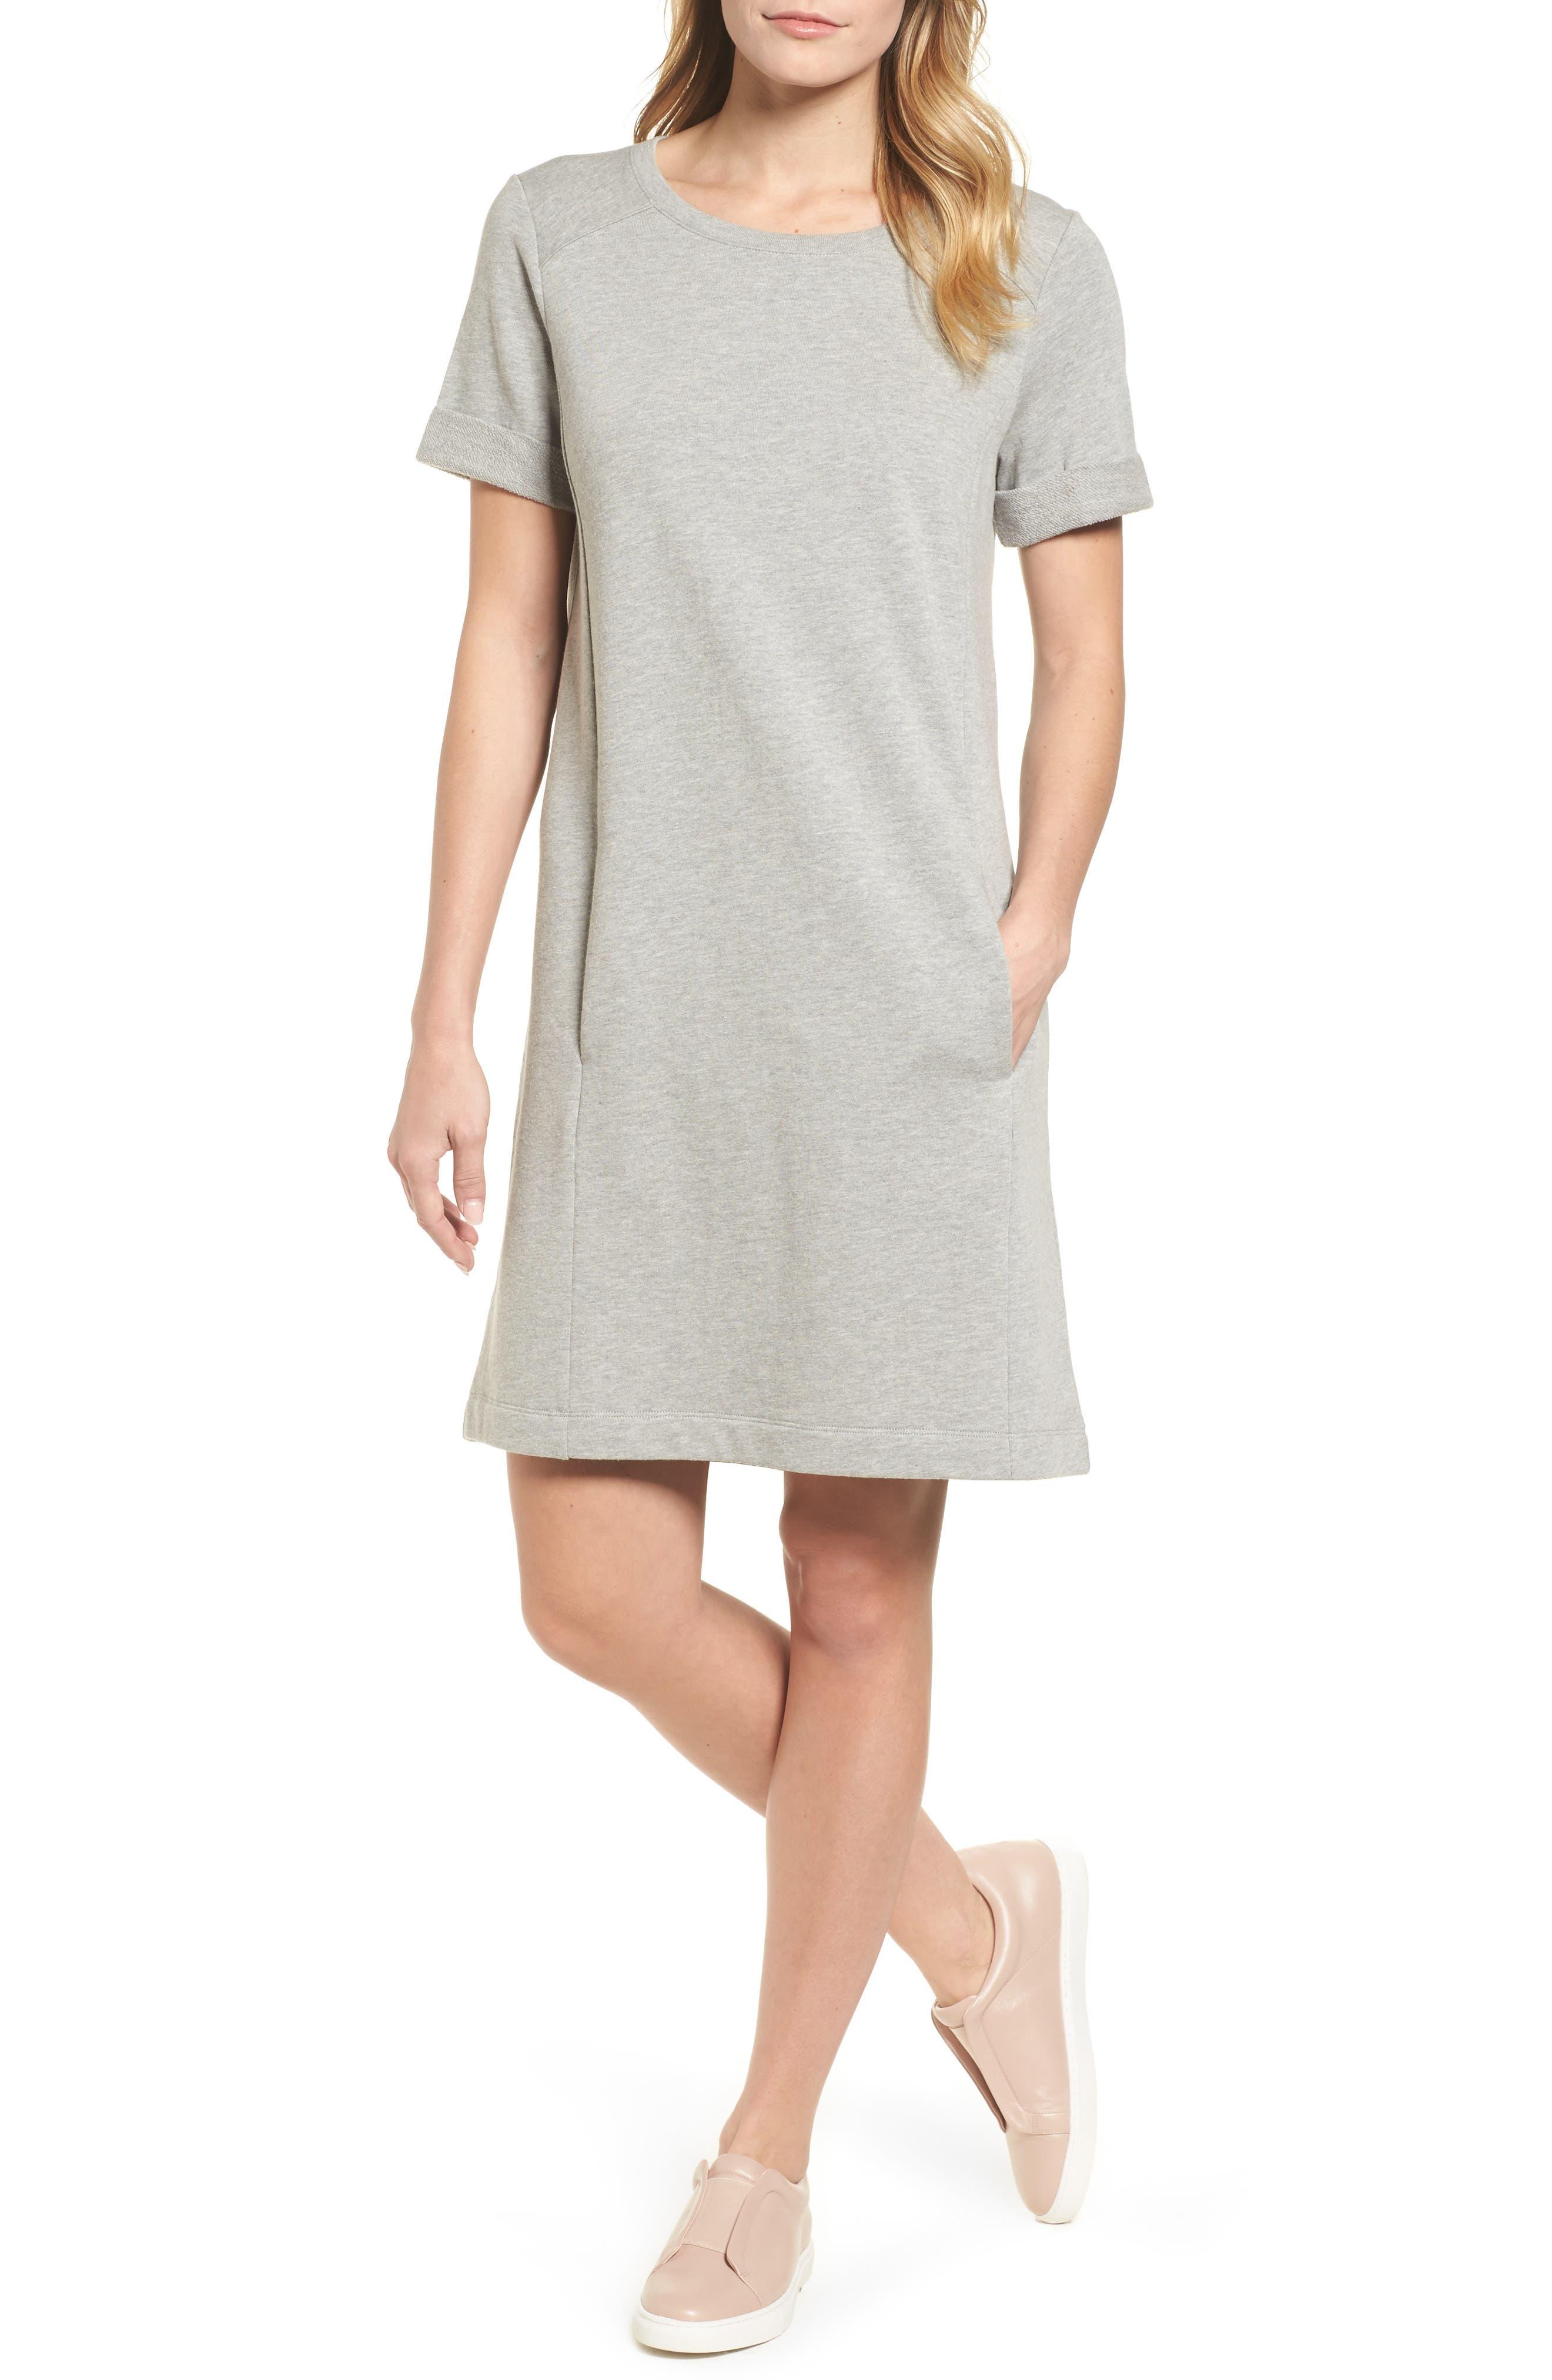 Petite Caslon Short Sleeve Cotton Blend Dress, Grey